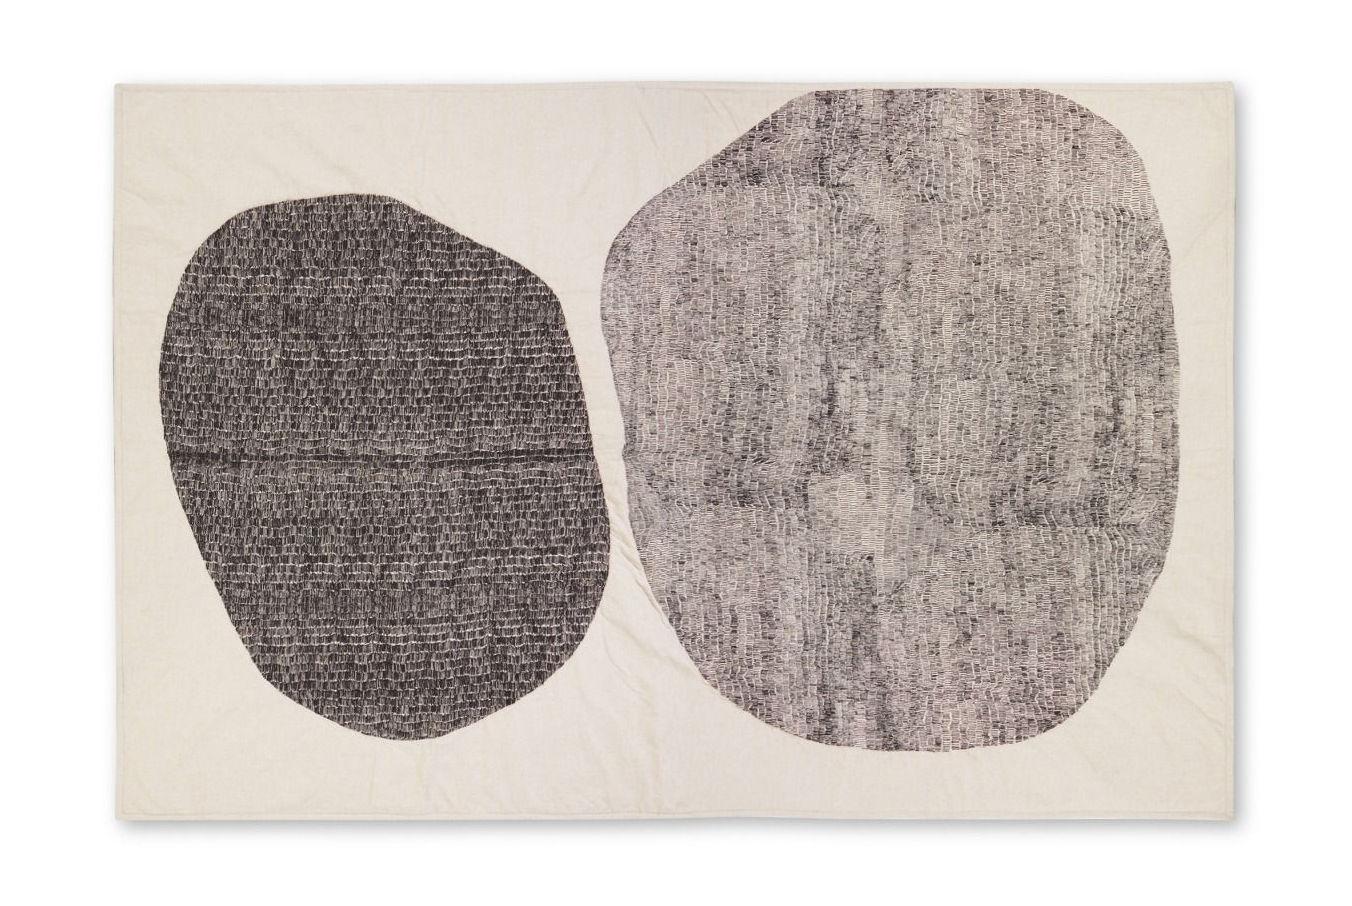 Decoration - Bedding & Bath Towels - Stitch Plaid - / 130 x 200 cm - Embroidered by Tom Dixon - Black & beige - Cotton, Linen, Polyester, Viscose